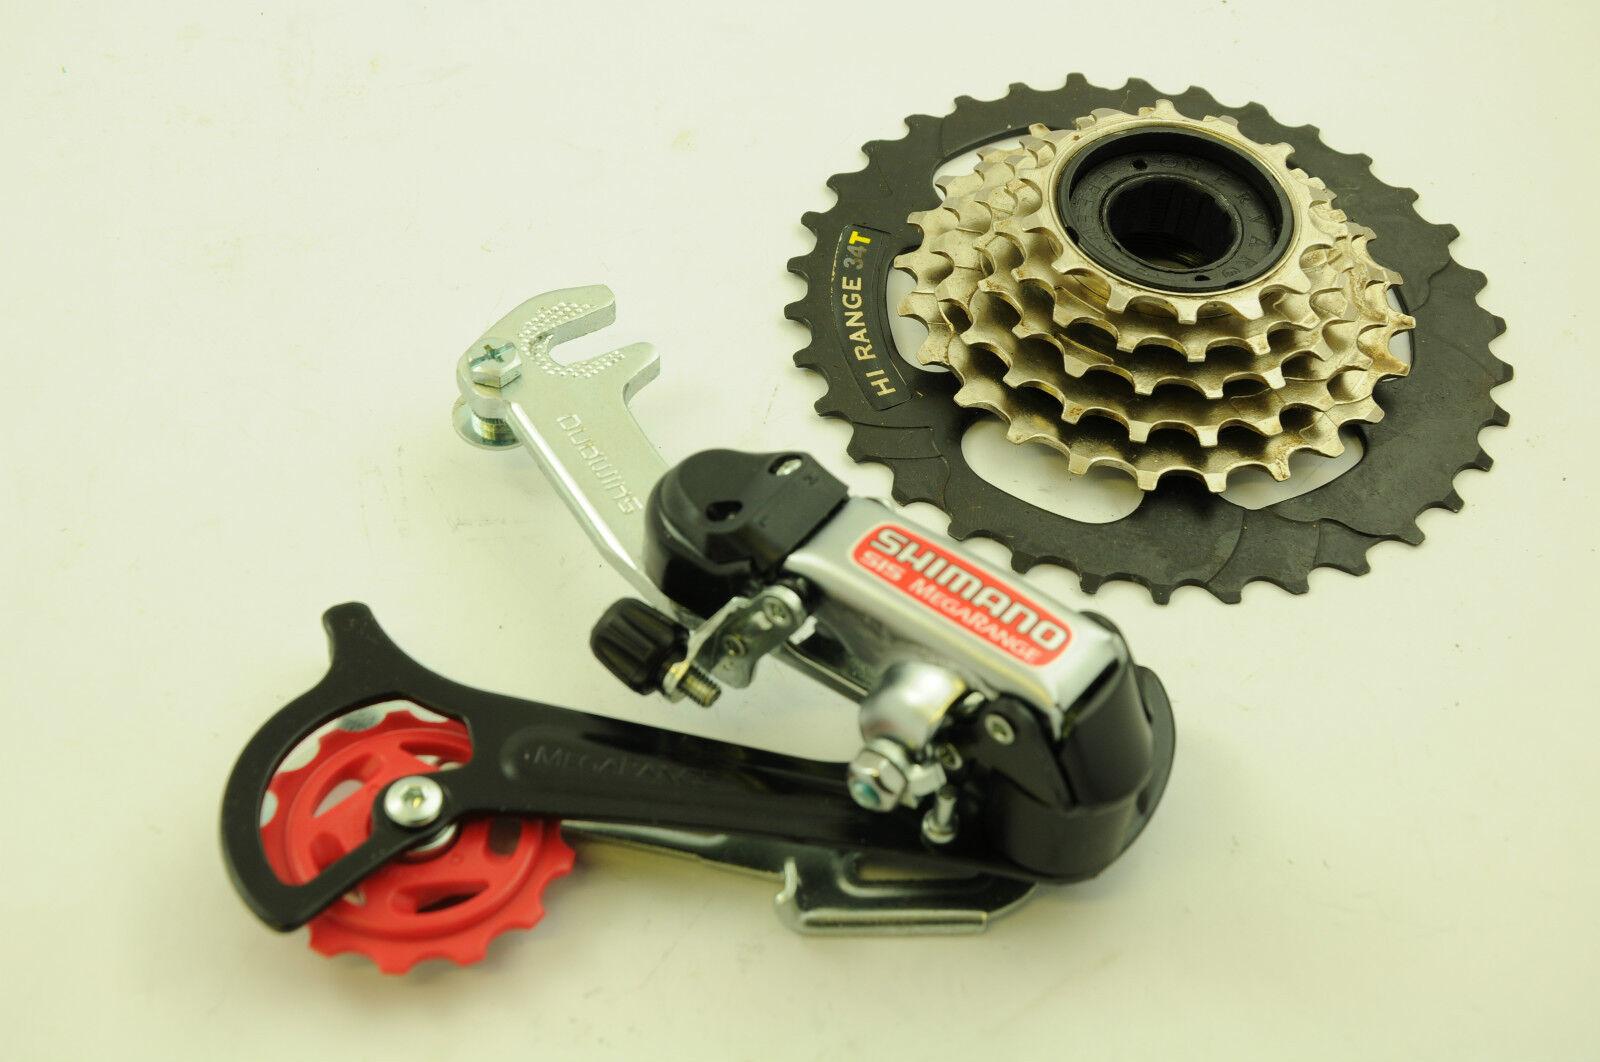 lower range gear set for your bike shimano megarange 6 speed mech freewheel eur 11 62